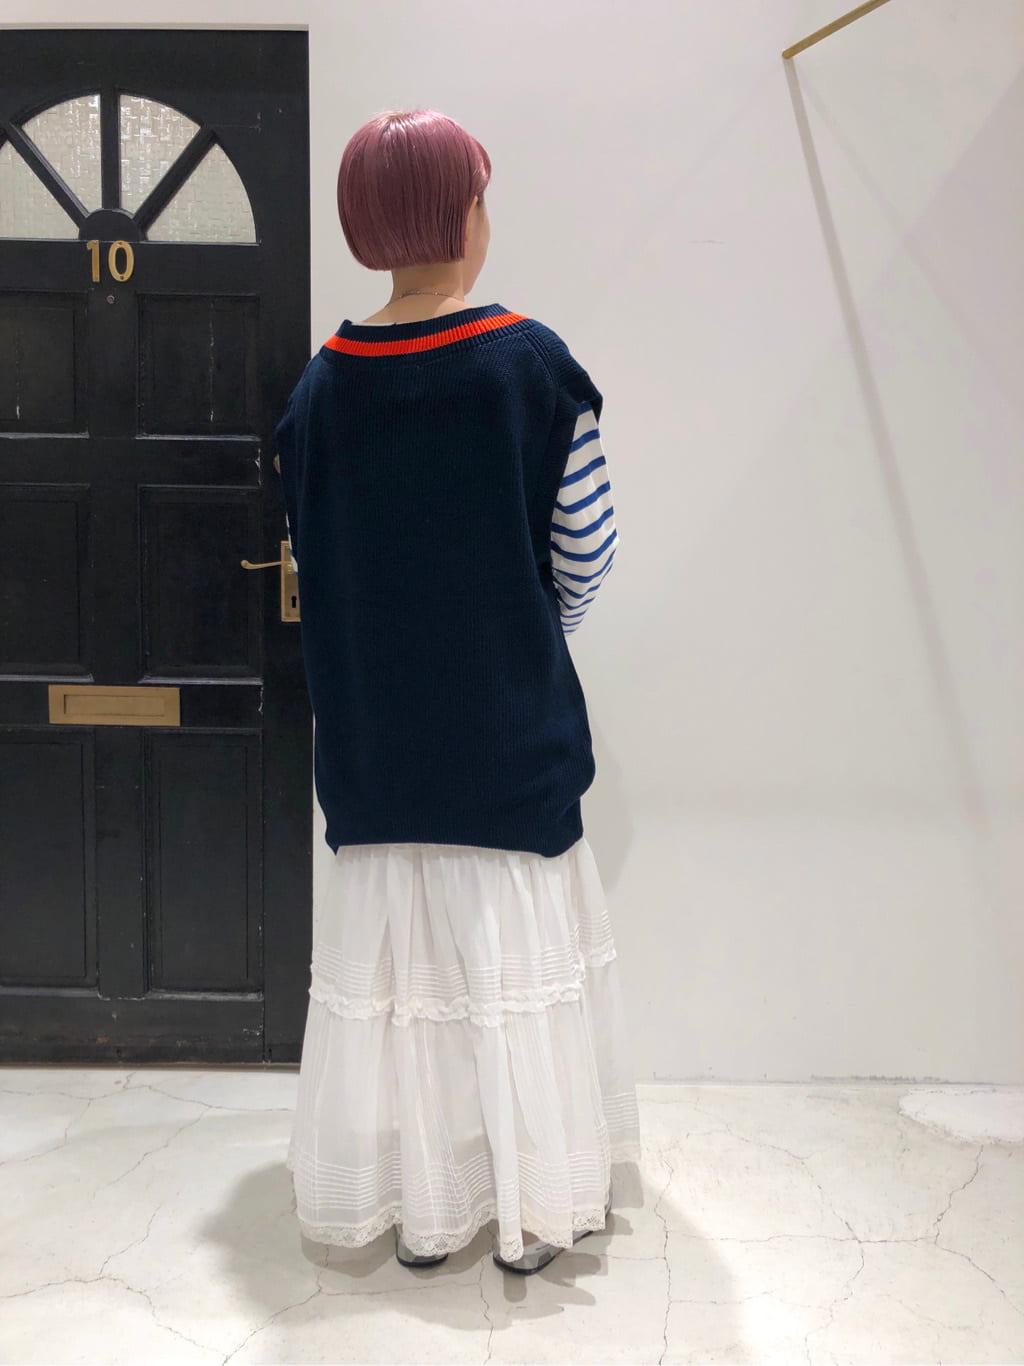 Dot and Stripes CHILD WOMAN ルクアイーレ 身長:157cm 2021.09.09